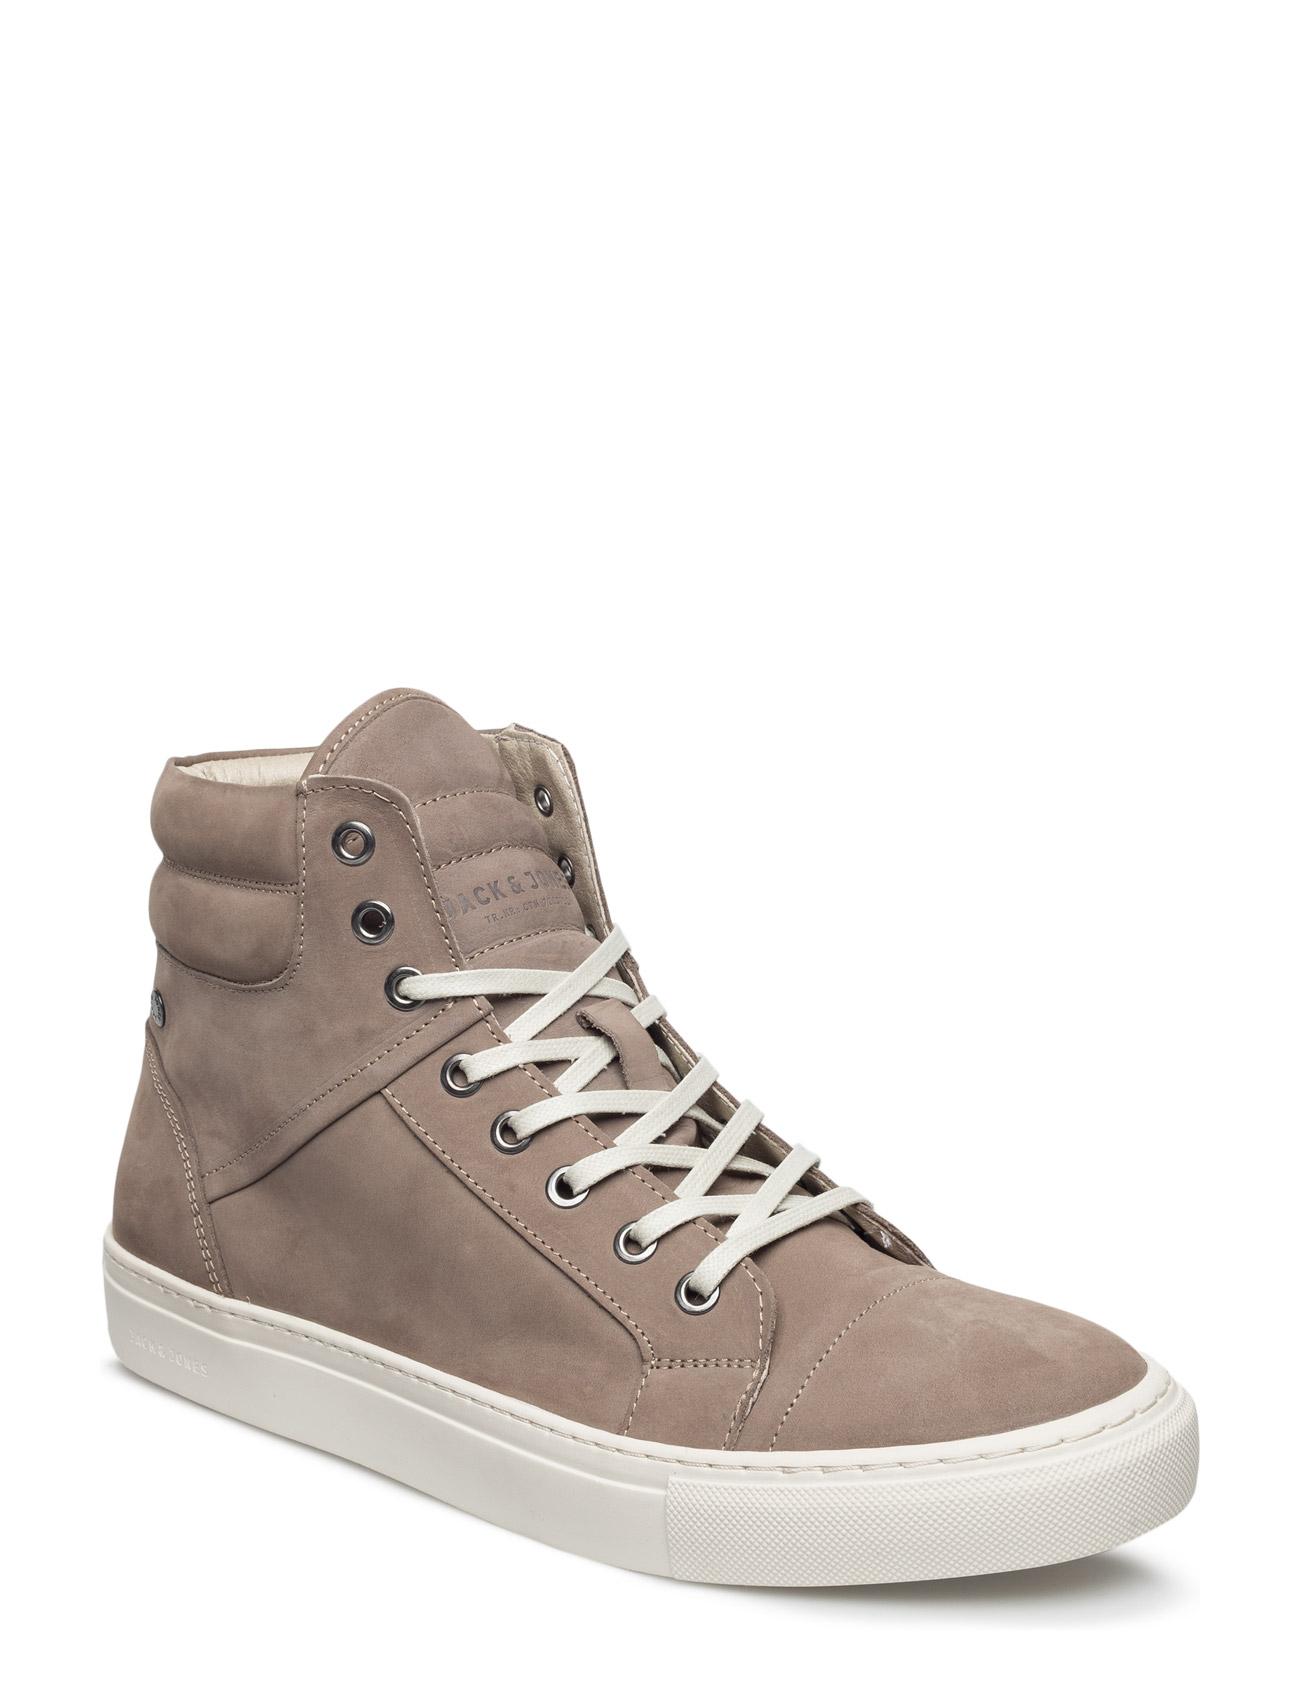 Jfwkenton Nubuck Sneaker Taupe Gray Jack & Jones Sneakers til Mænd i